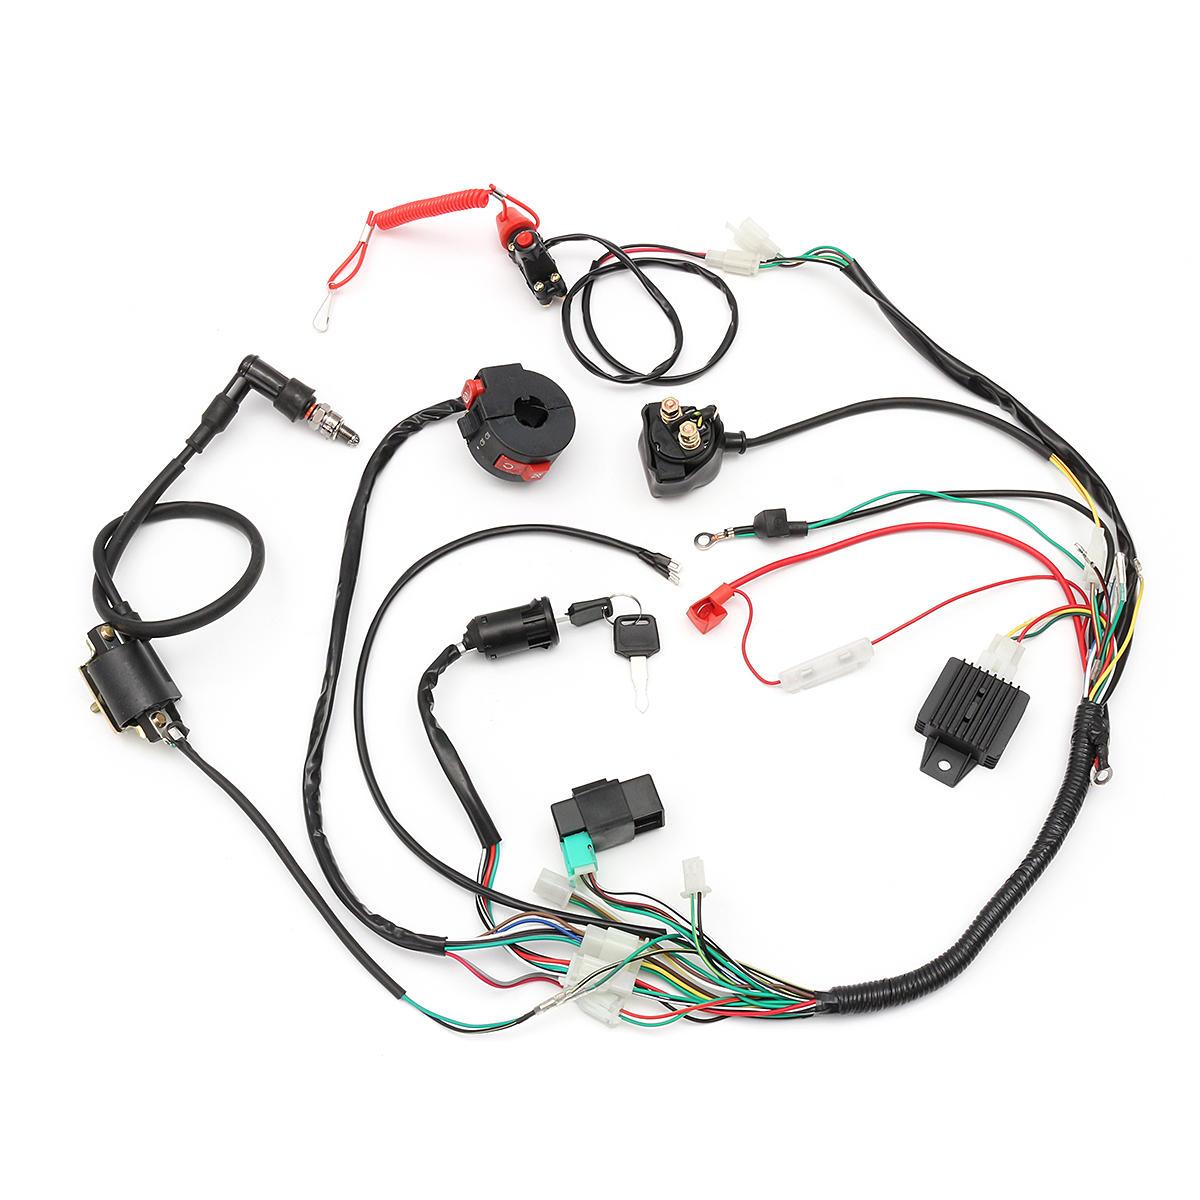 110cc Wiring Harness - Wiring Diagram Work on